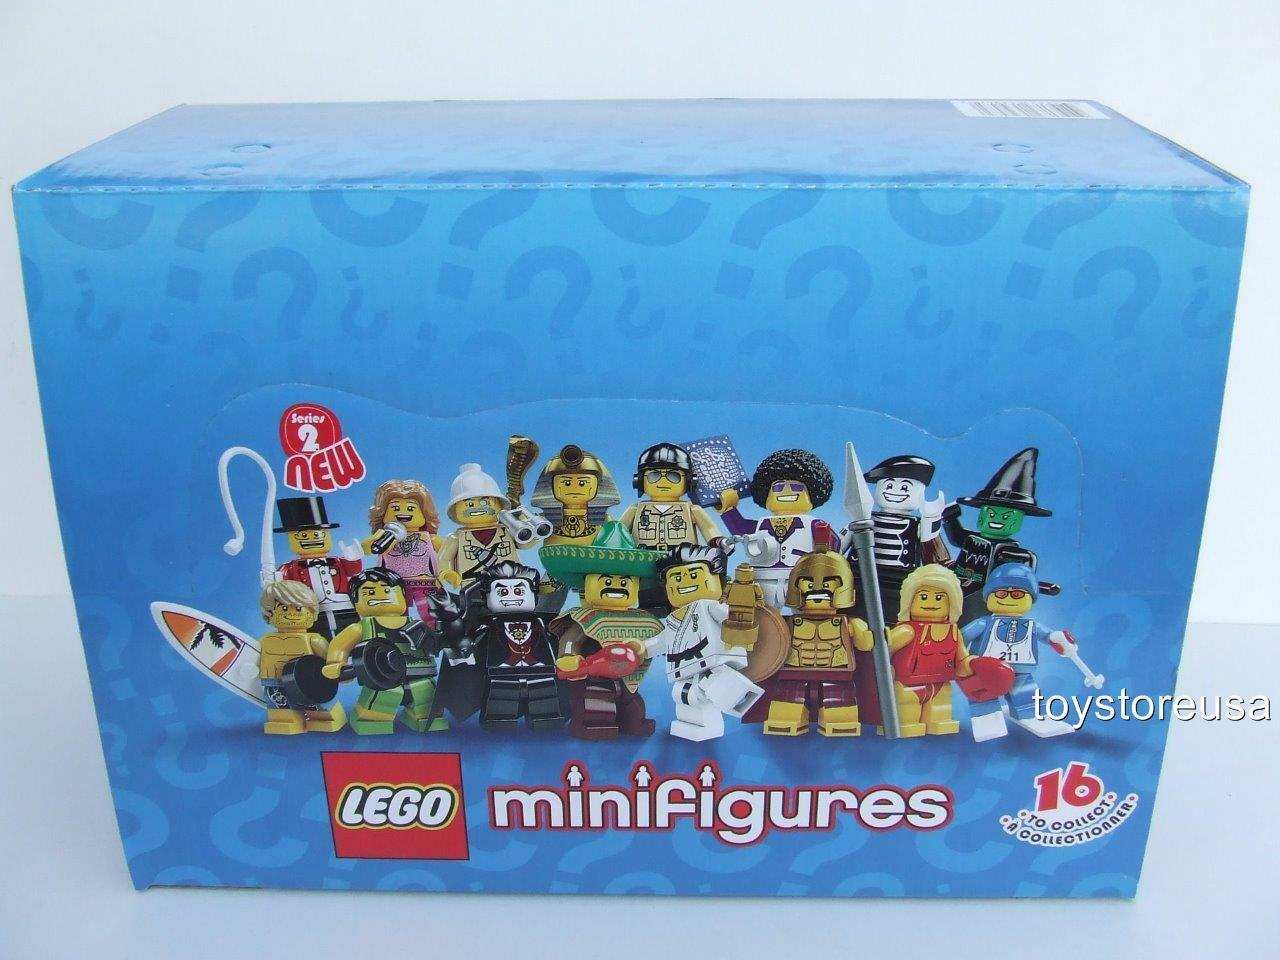 NUEVO  Conjunto de Minifiguras LEGO serie 2 de 60 paquete raro conjunto Caja Sellada (8684)